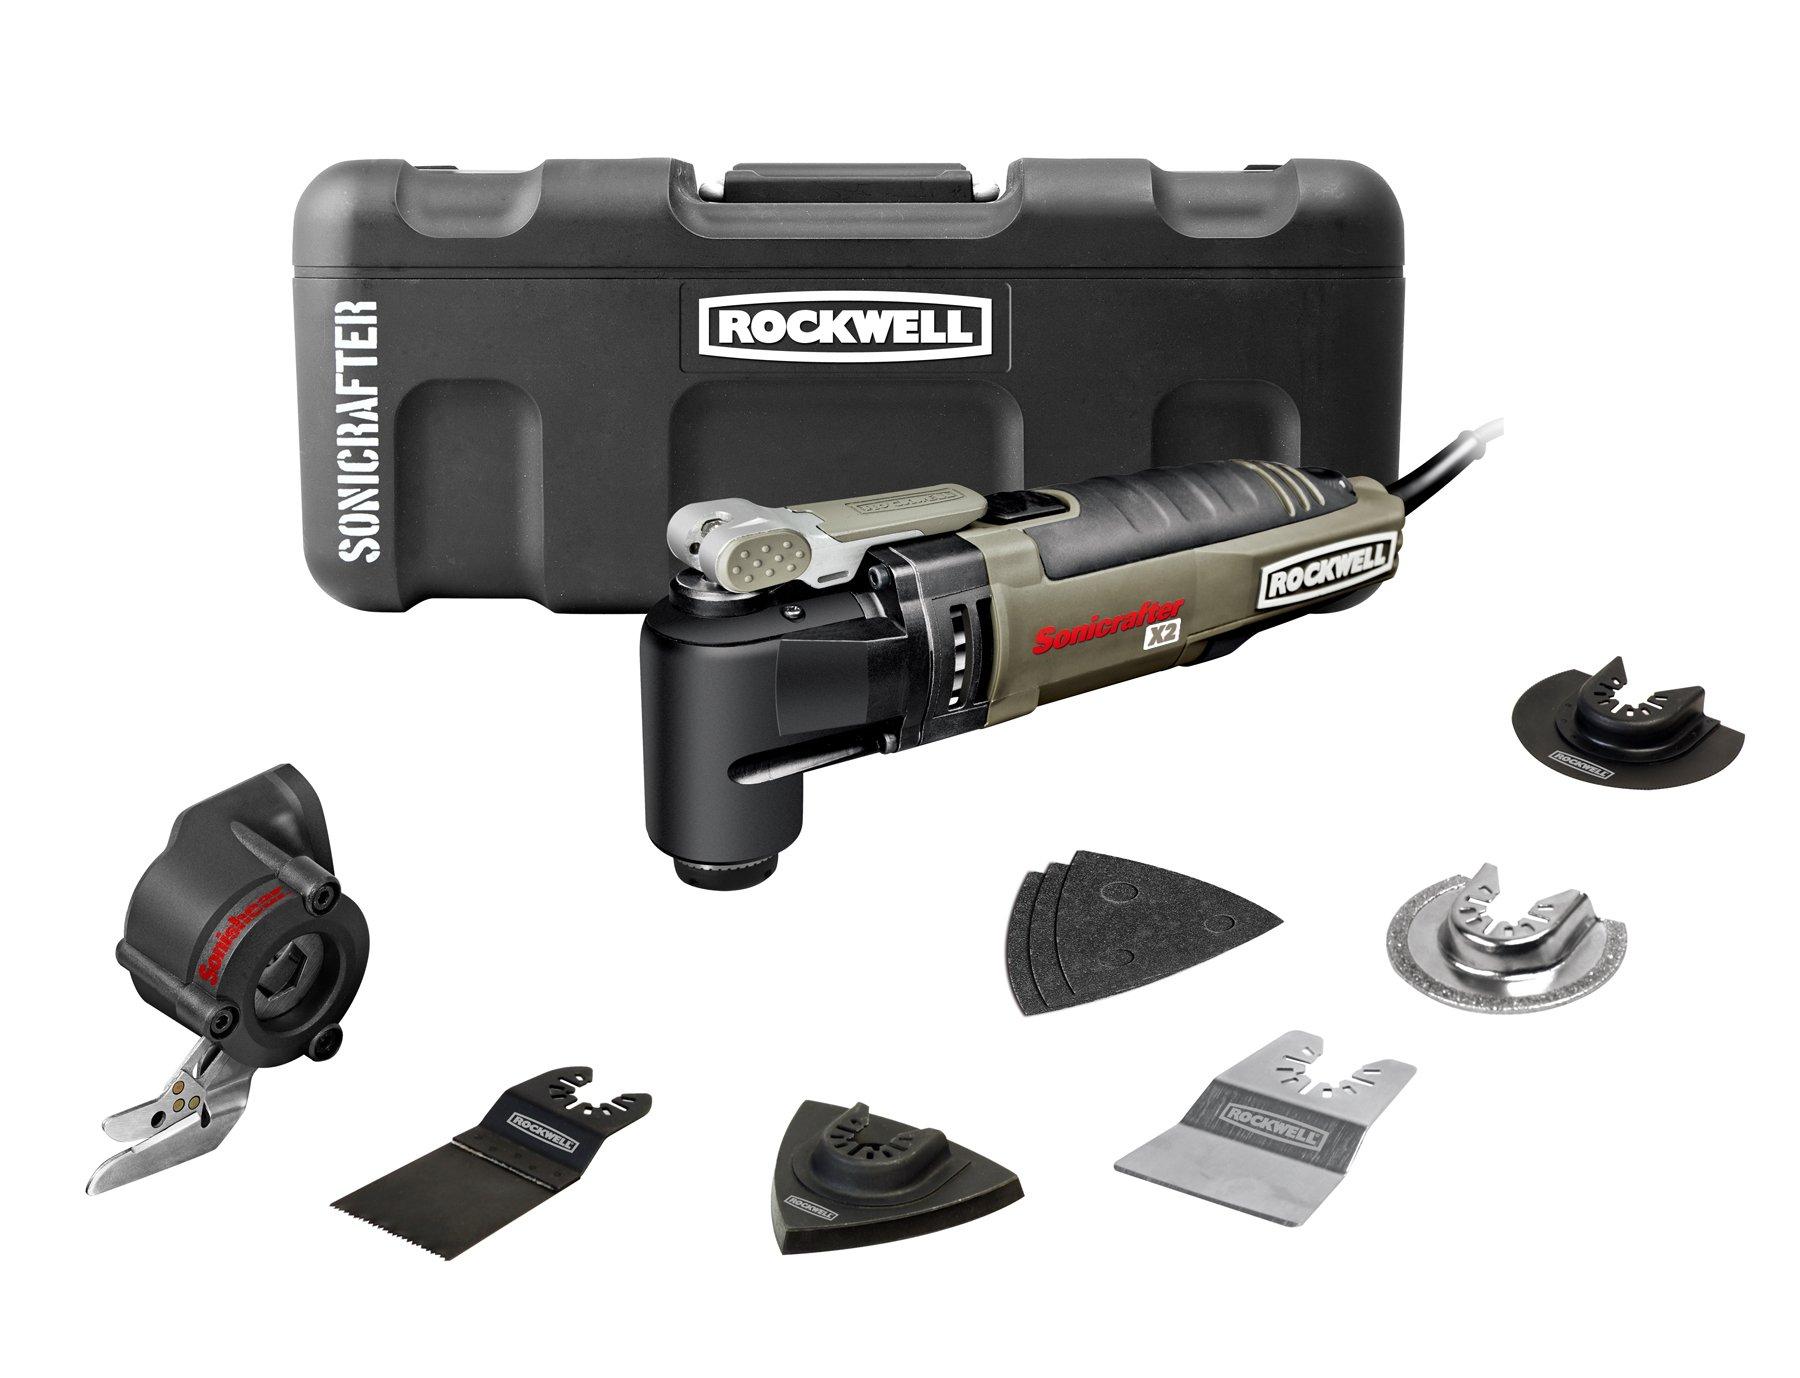 Rockwell RK5140K Oscillating Tool Kit